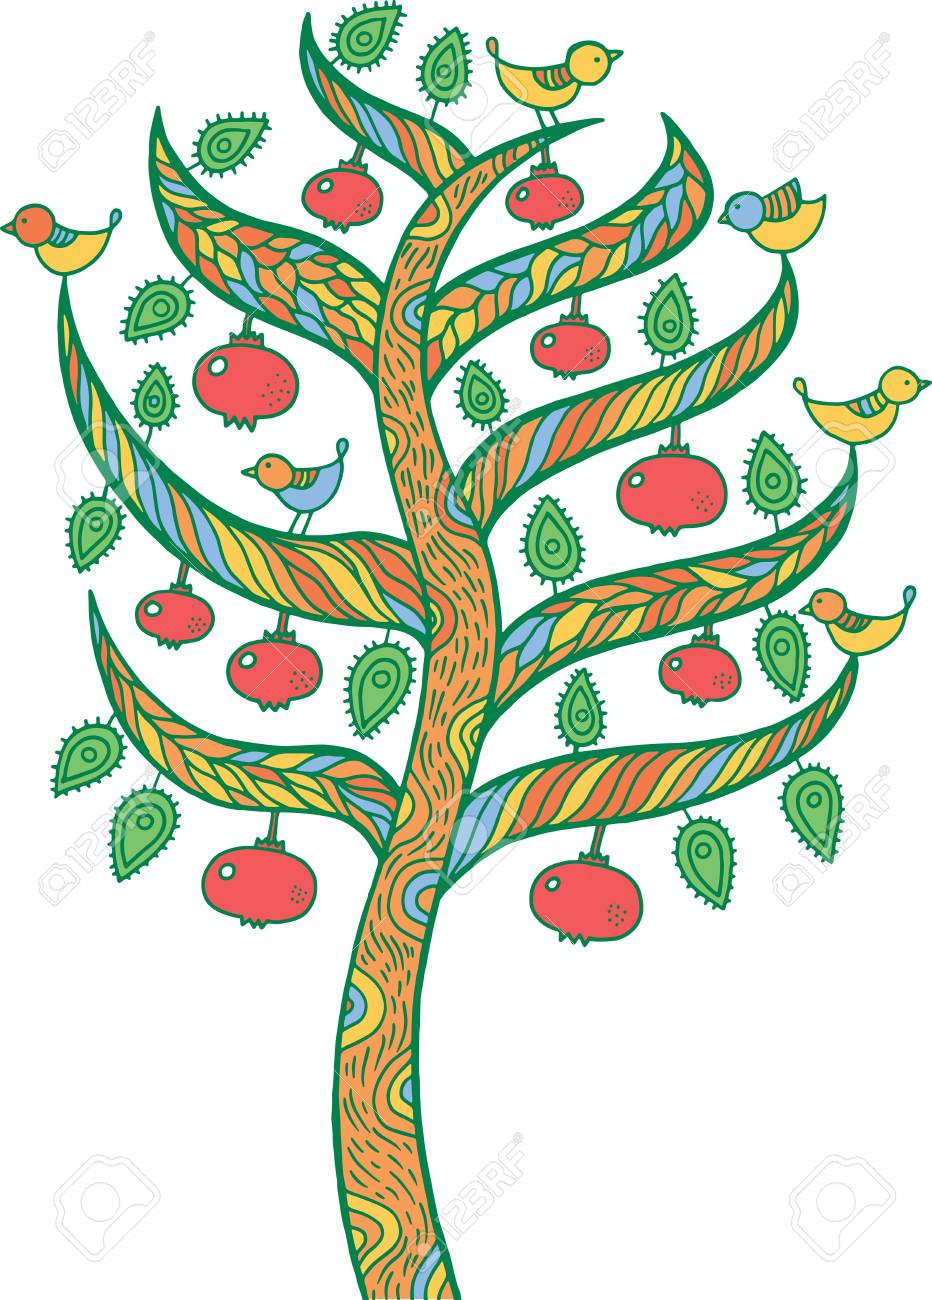 Pomegranate Tree - Kids Illustration. Colorful Doodle Art Drawing ...